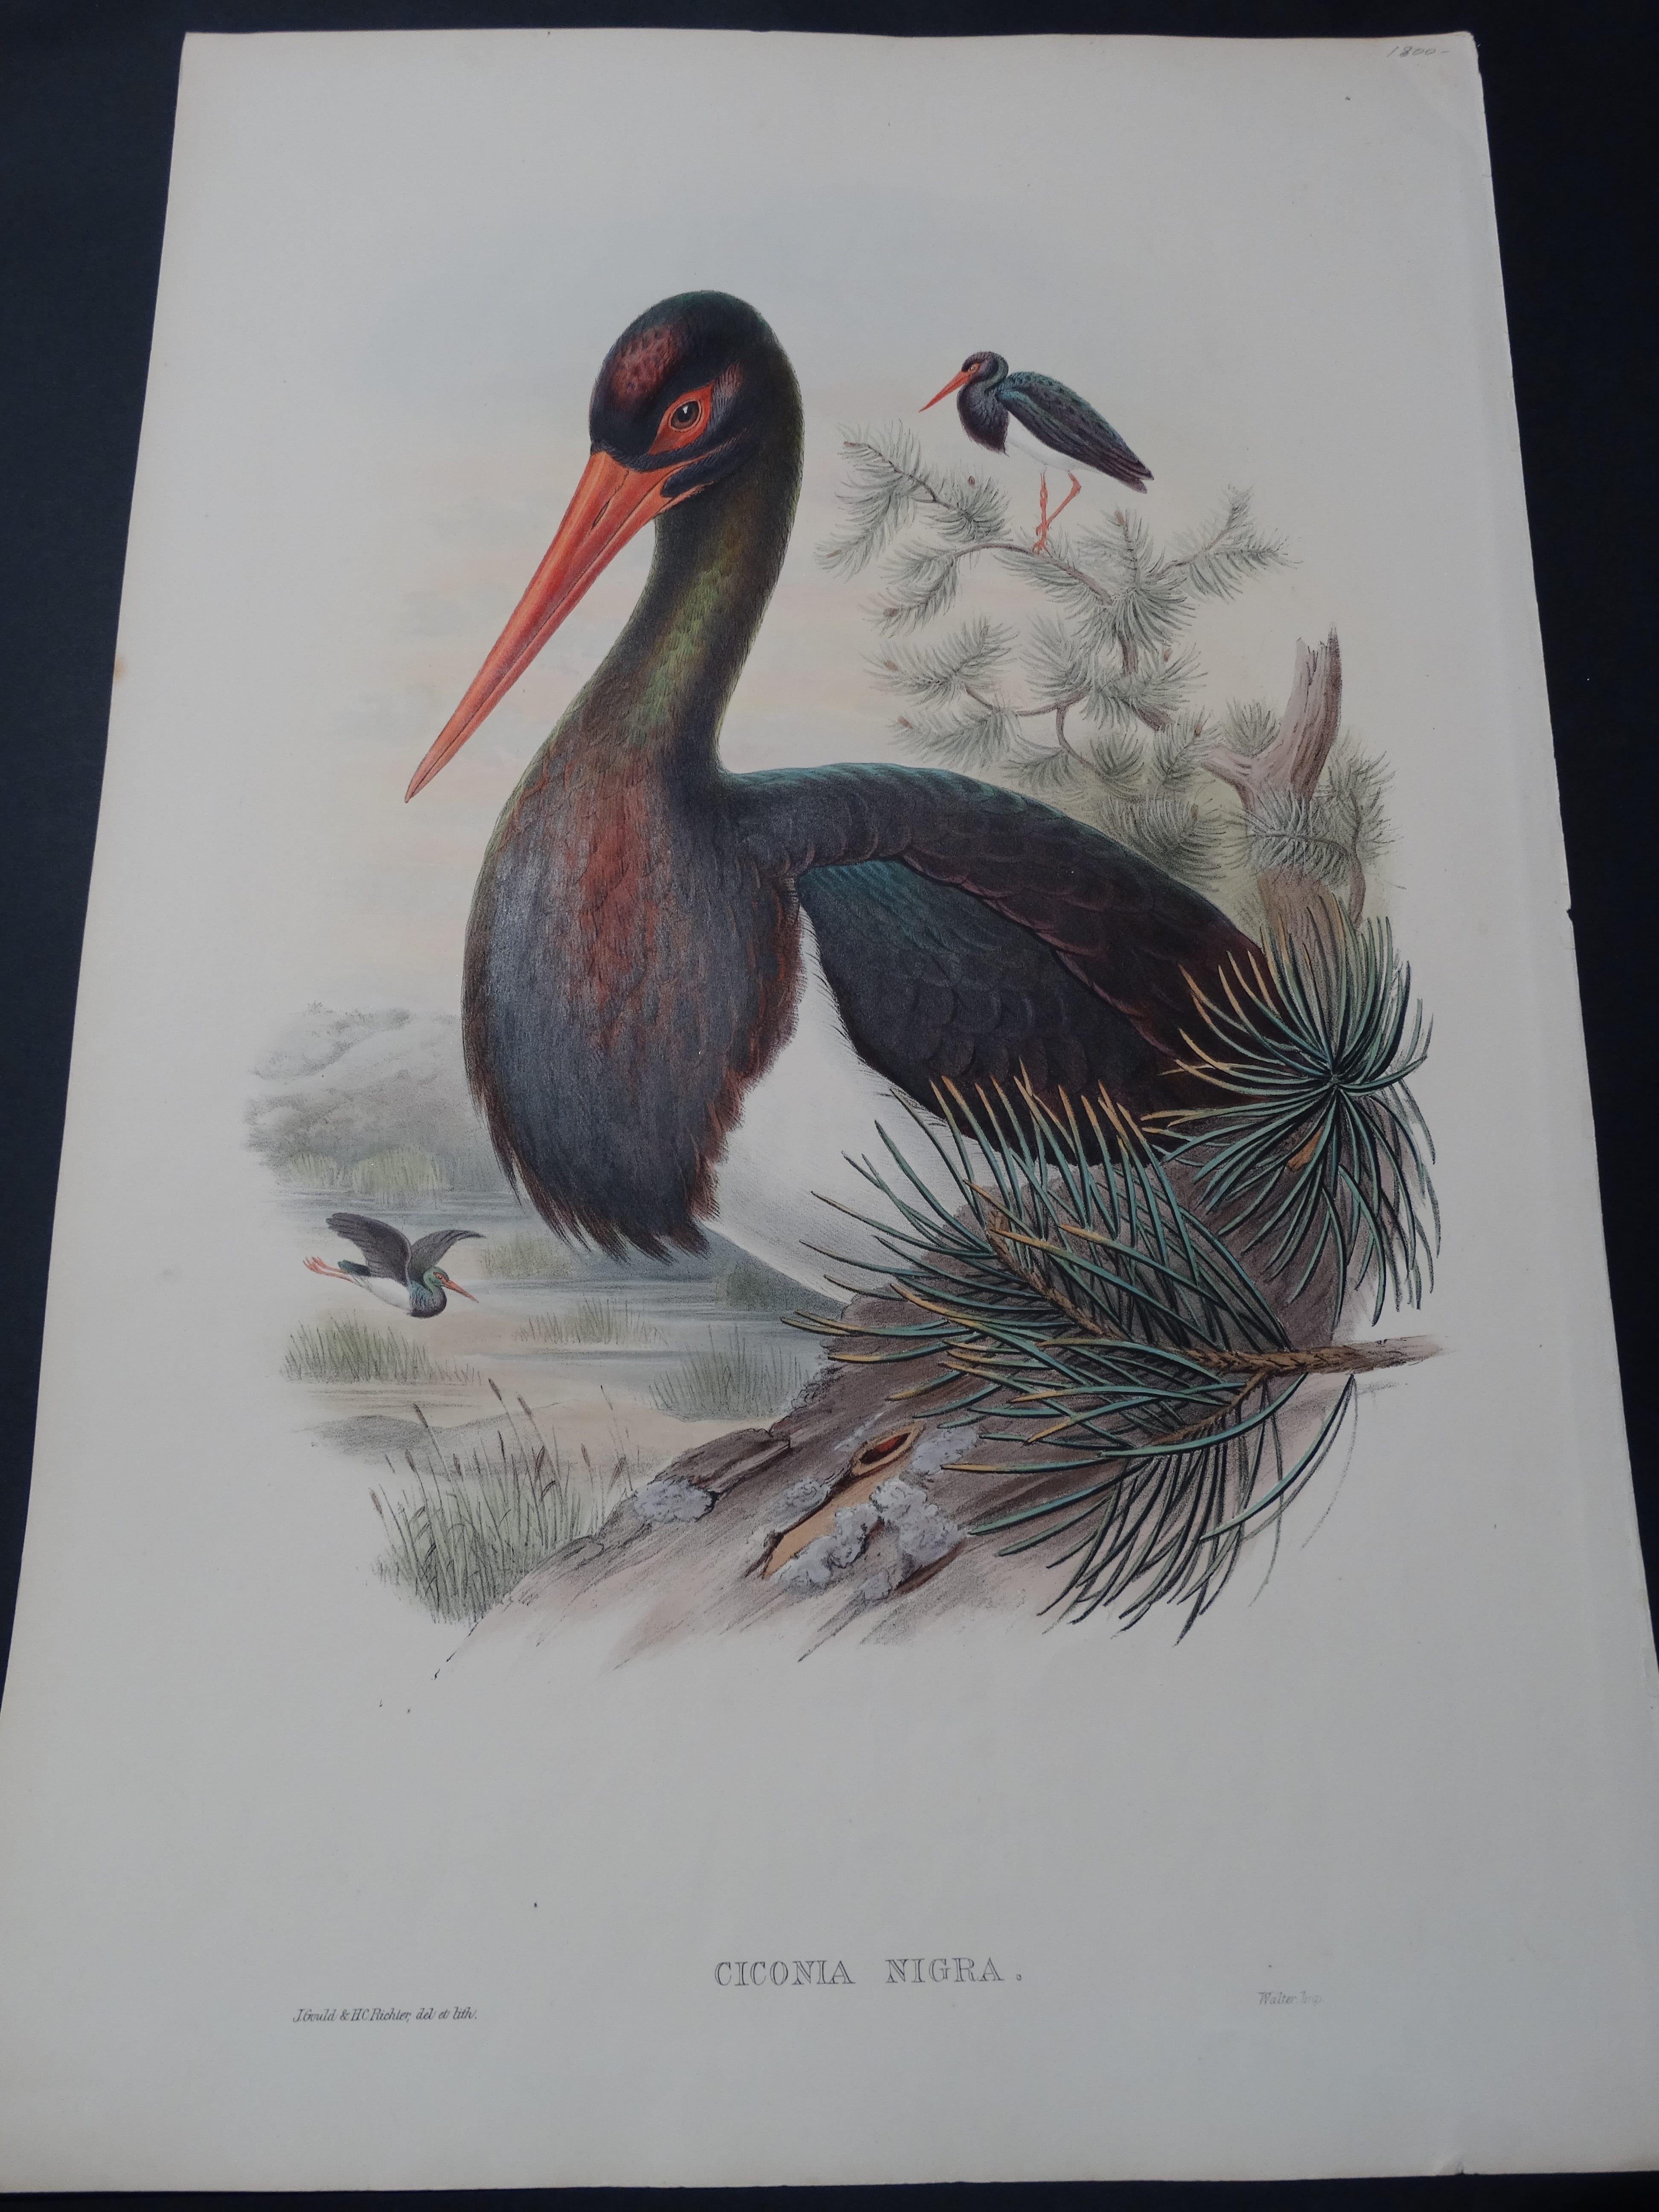 John Gould Water Birds Ciconia Nigra